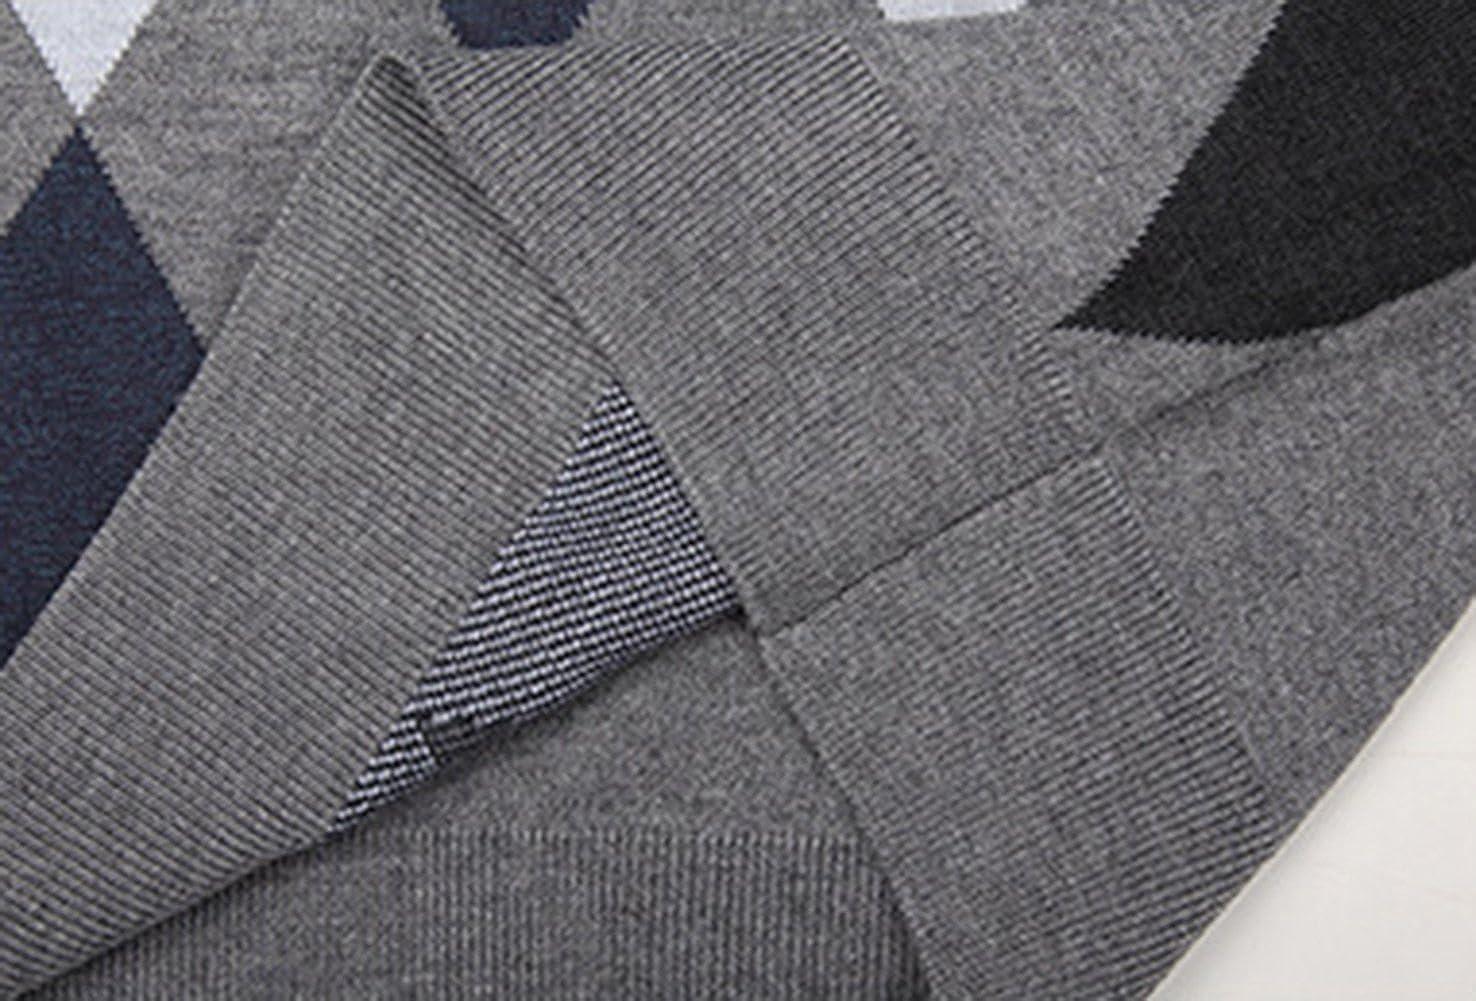 FULIER Winter Mens Gilet V-Neck Sleeveless Vest Waistcoat Classic Business Gentleman Argyle Pattern Design Soft Knitwear Warm Sweater Tank Tops